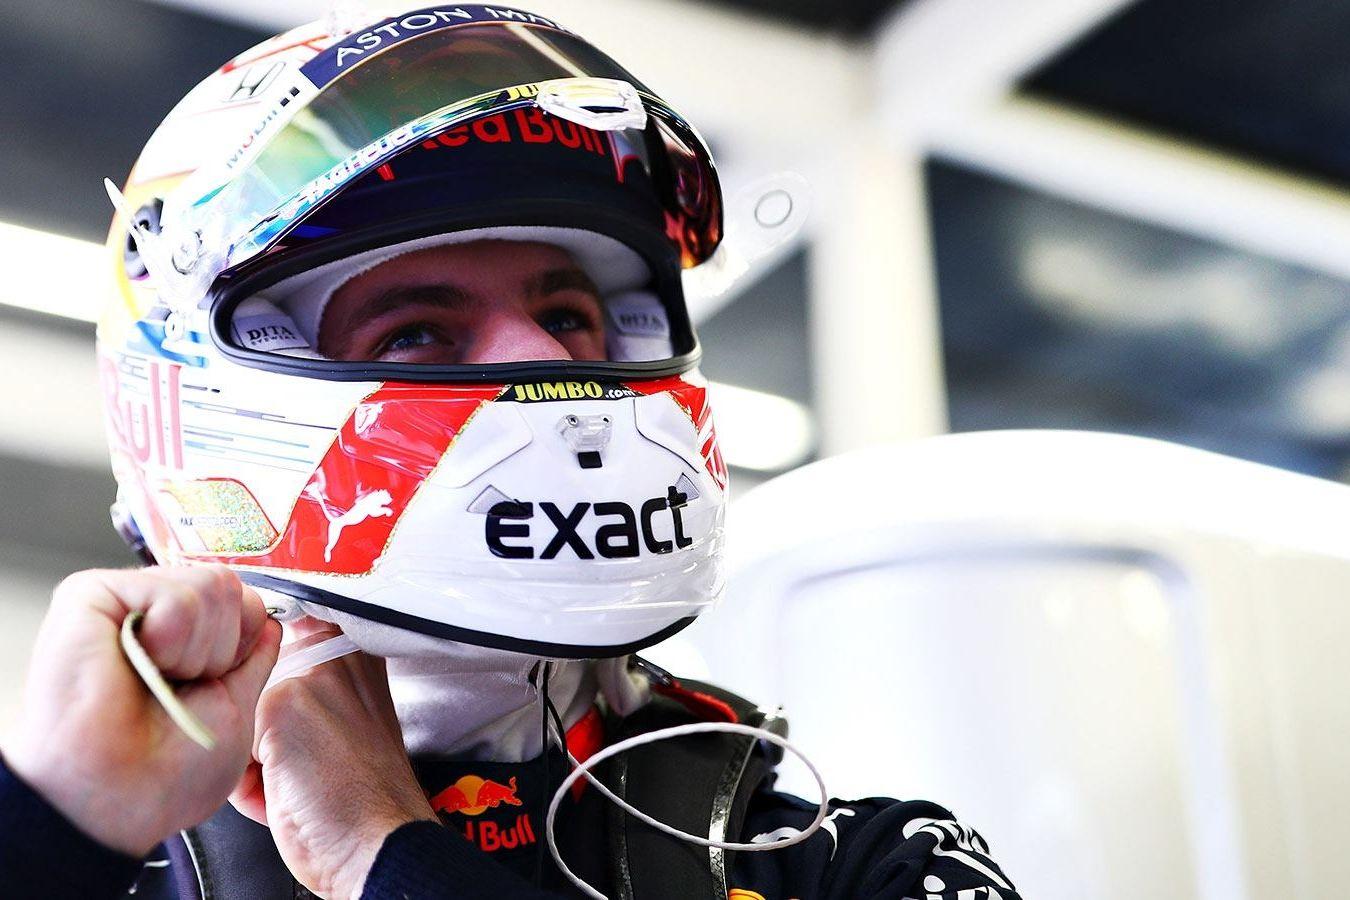 © Red Bull-Verstappen sort un tour d'anthologie au Hungaroring